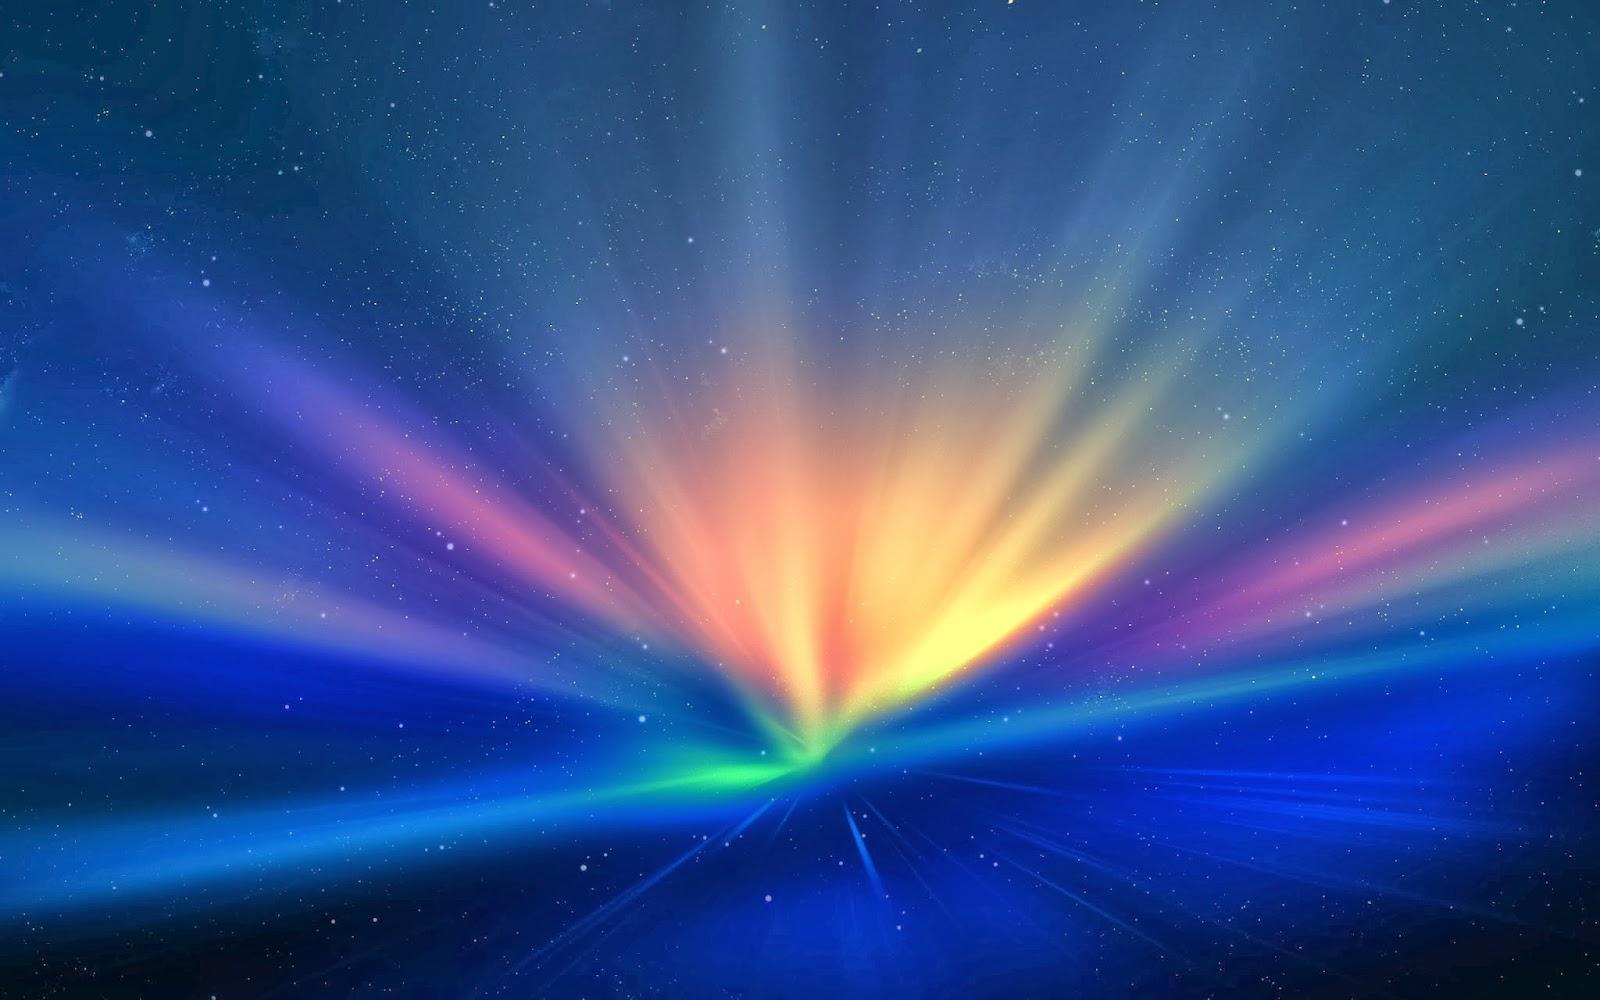 Fondos de margarita de colores fondos de pantalla de for Bajar fondos de pantalla hd